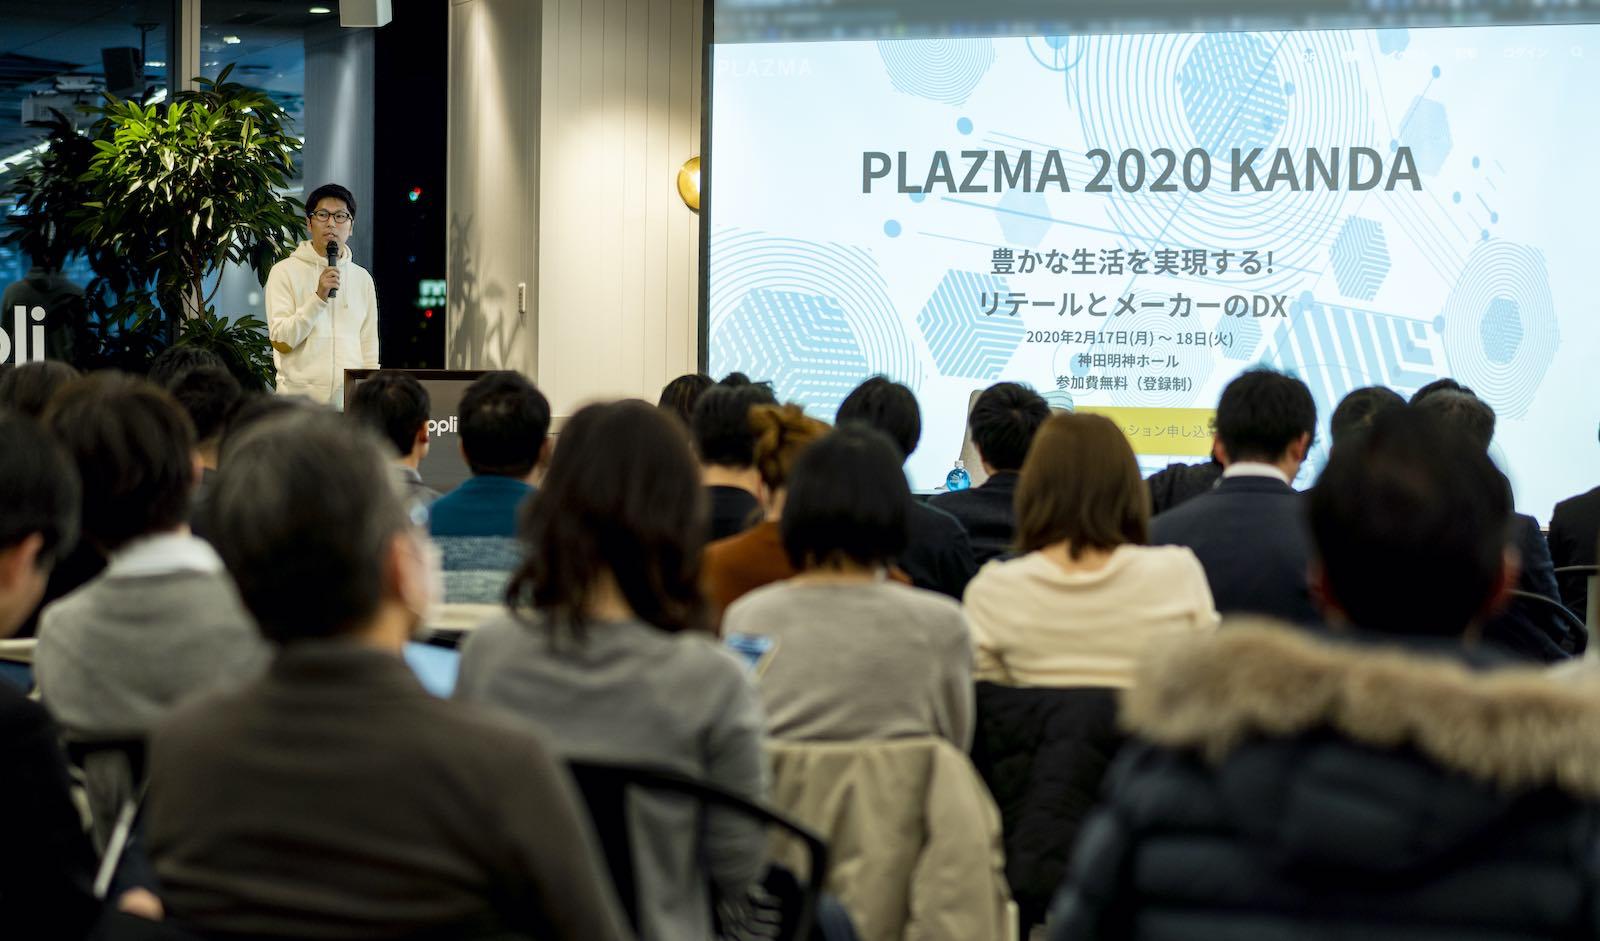 PLAZMA 2020 KANDAを紹介する小林広紀(トレジャーデータ株式会社 マーケティングマネージャー)